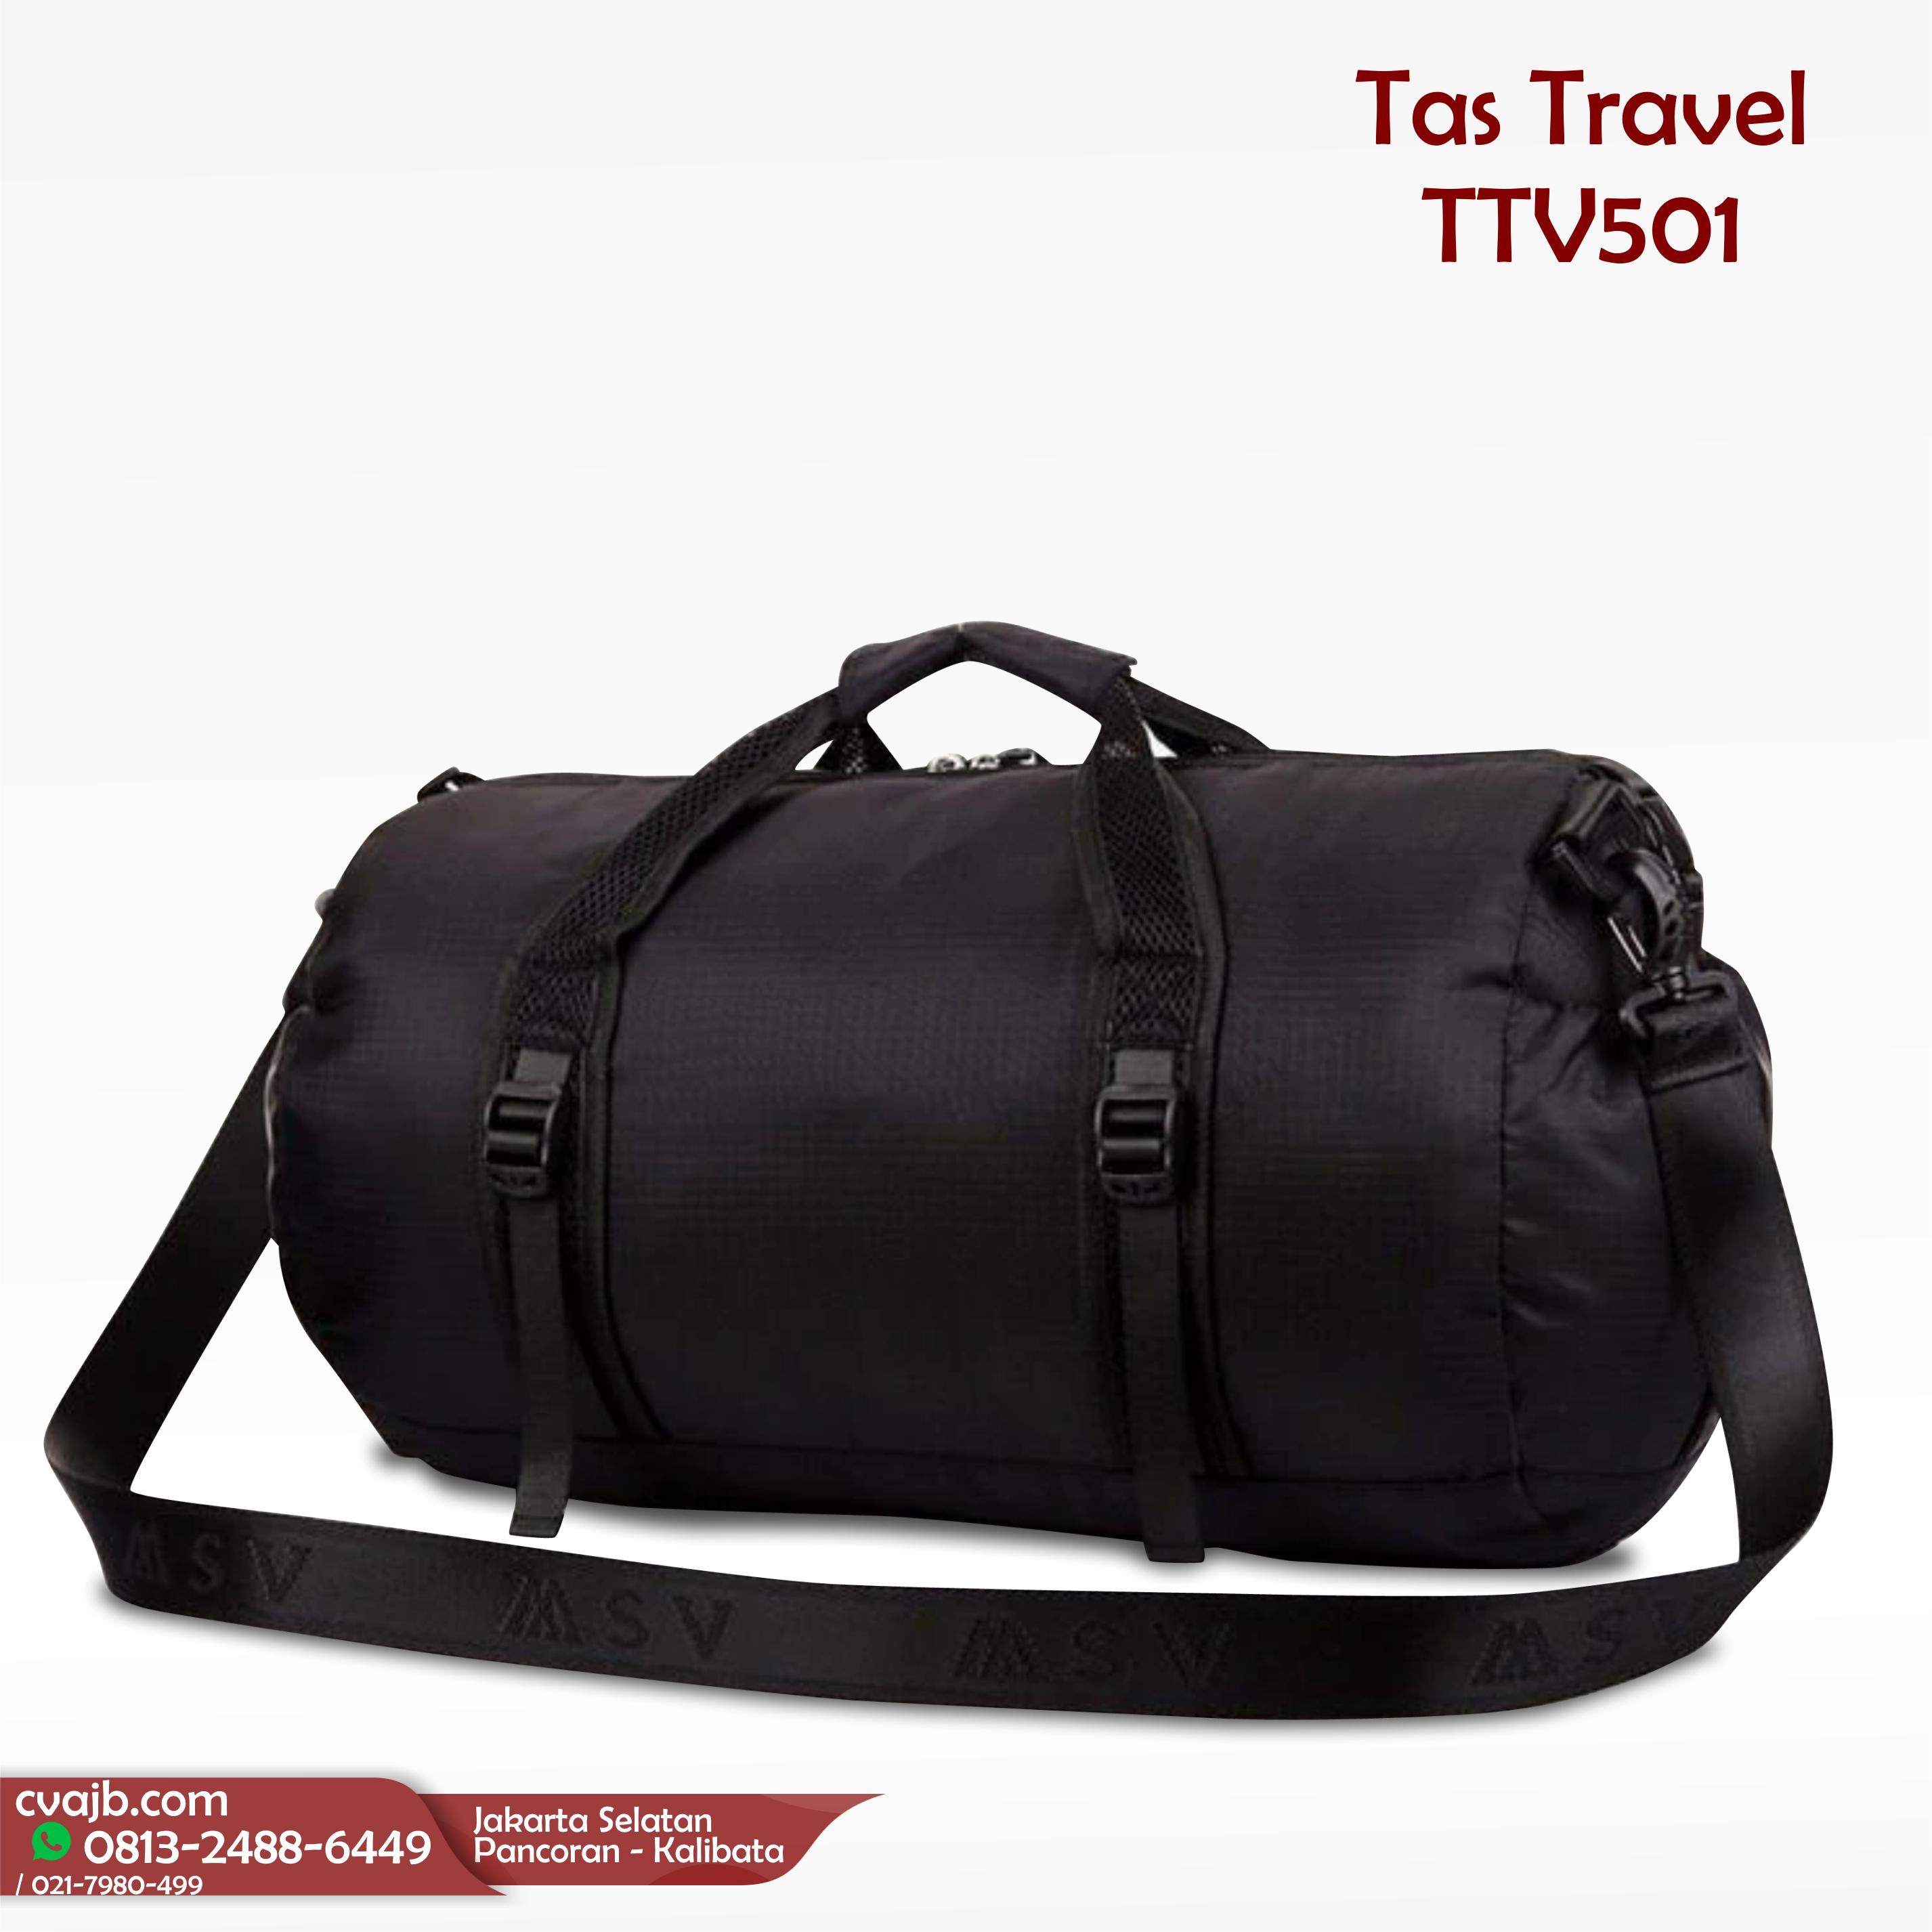 Konveksi Tas Seminar jakarta Tas Travel TTV501